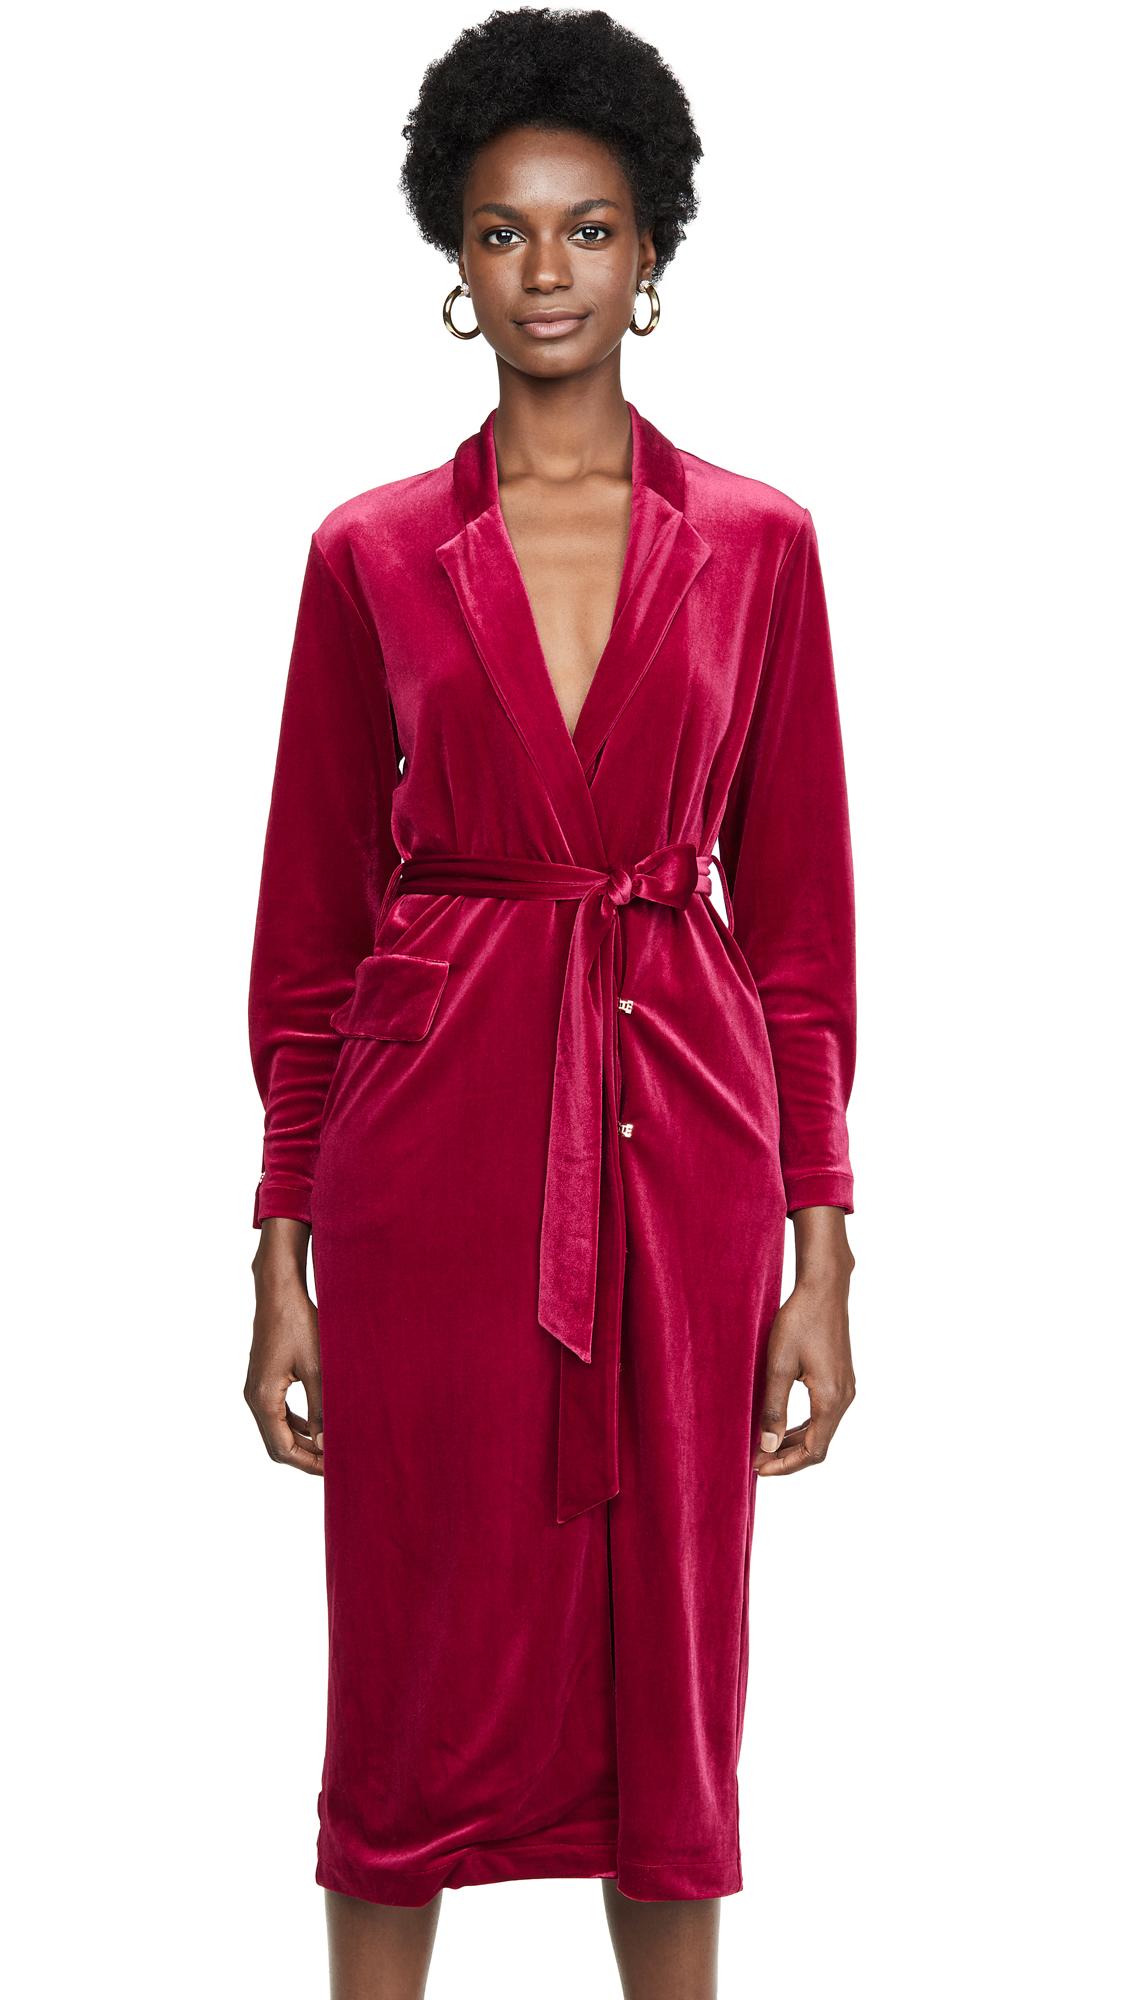 Buy OPT Aura Dress online beautiful OPT Clothing, Dresses